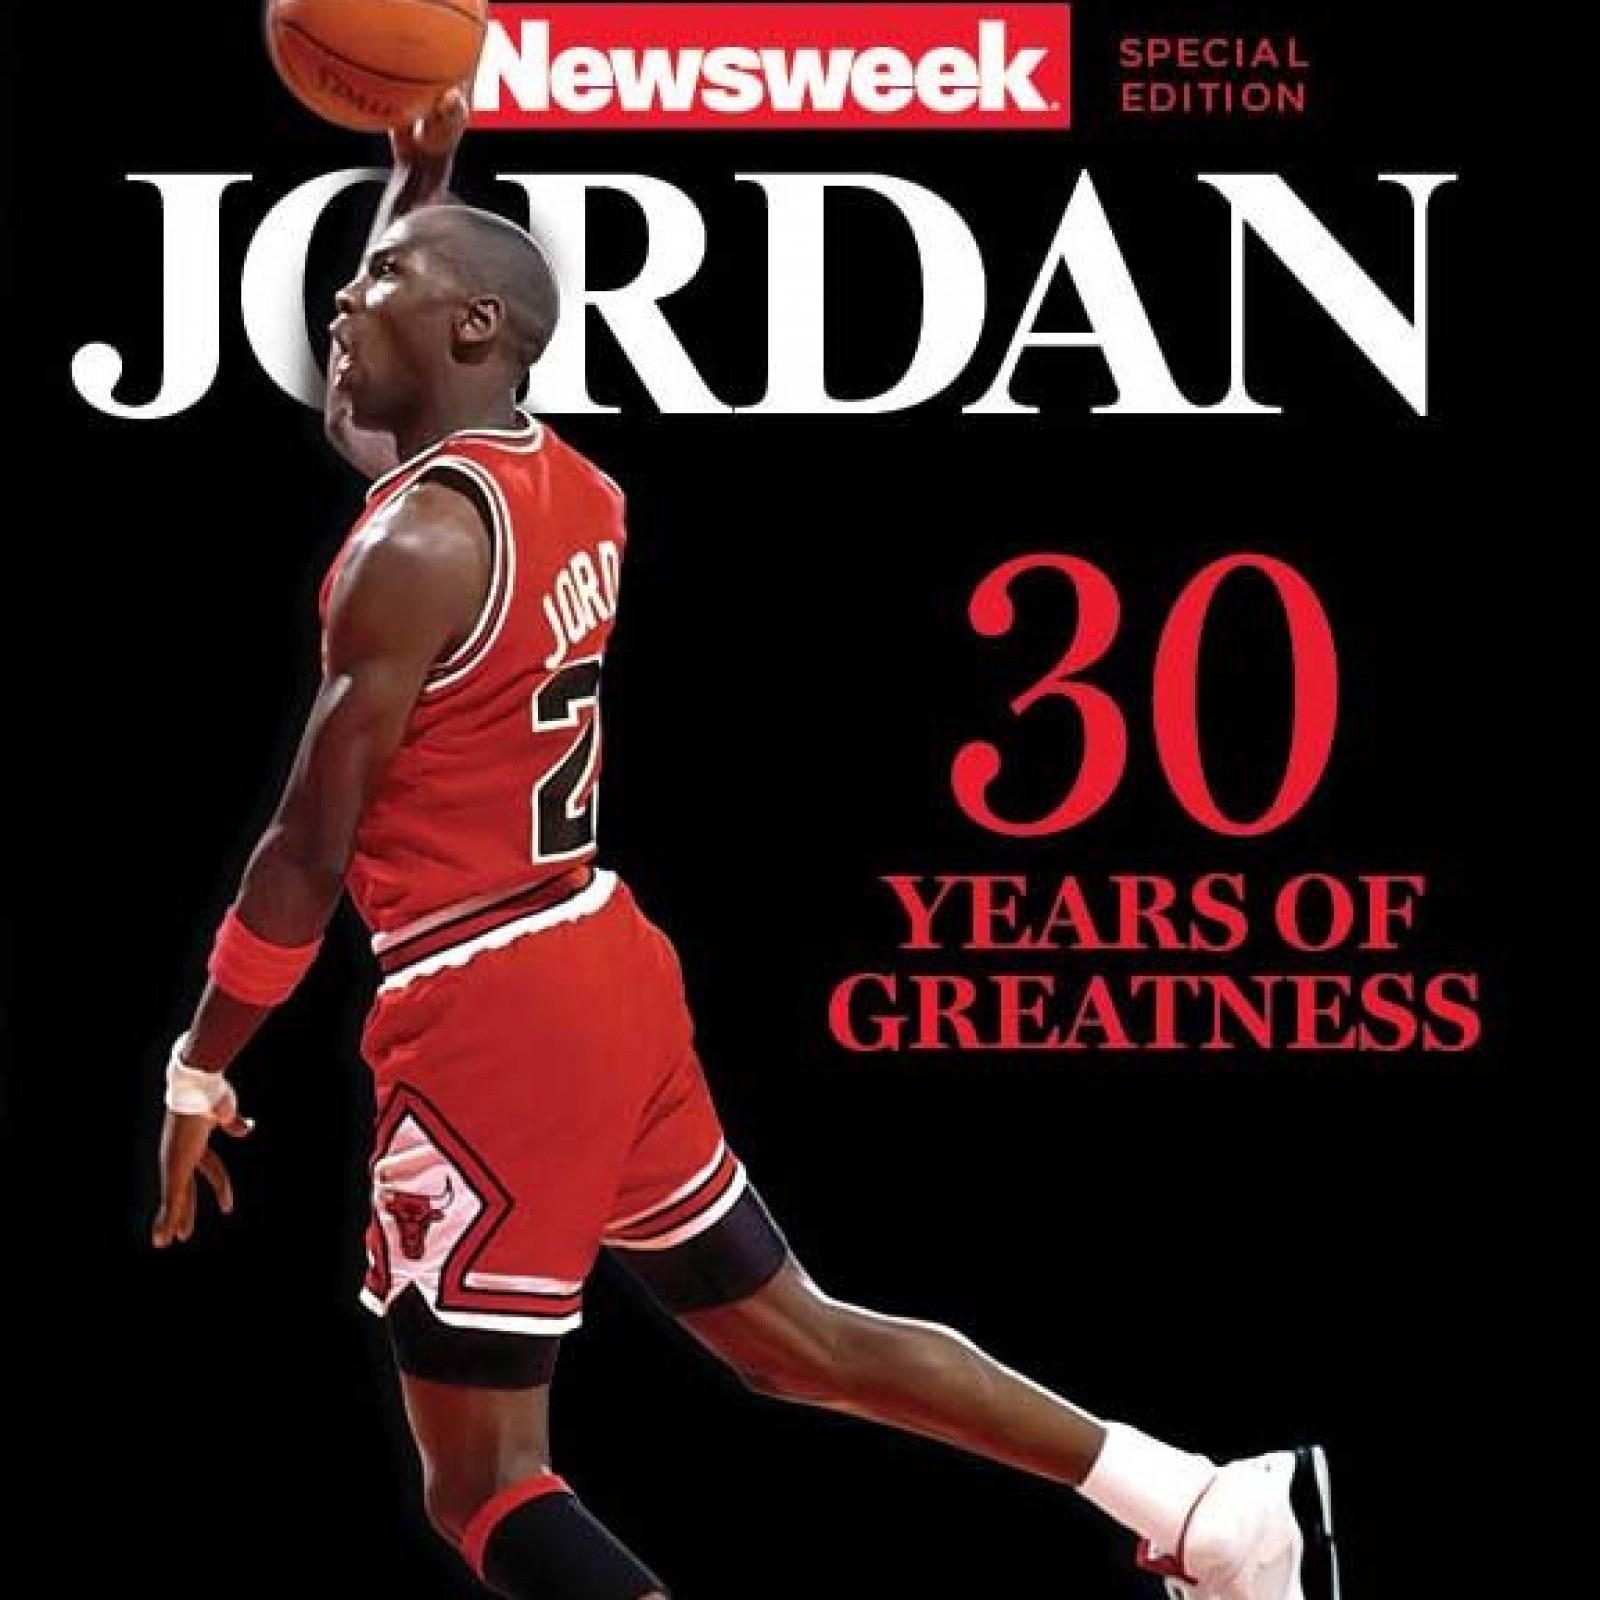 97ad7e91659 Michael Jordan's First Game-Winning Shot Clinched NCAA Championship